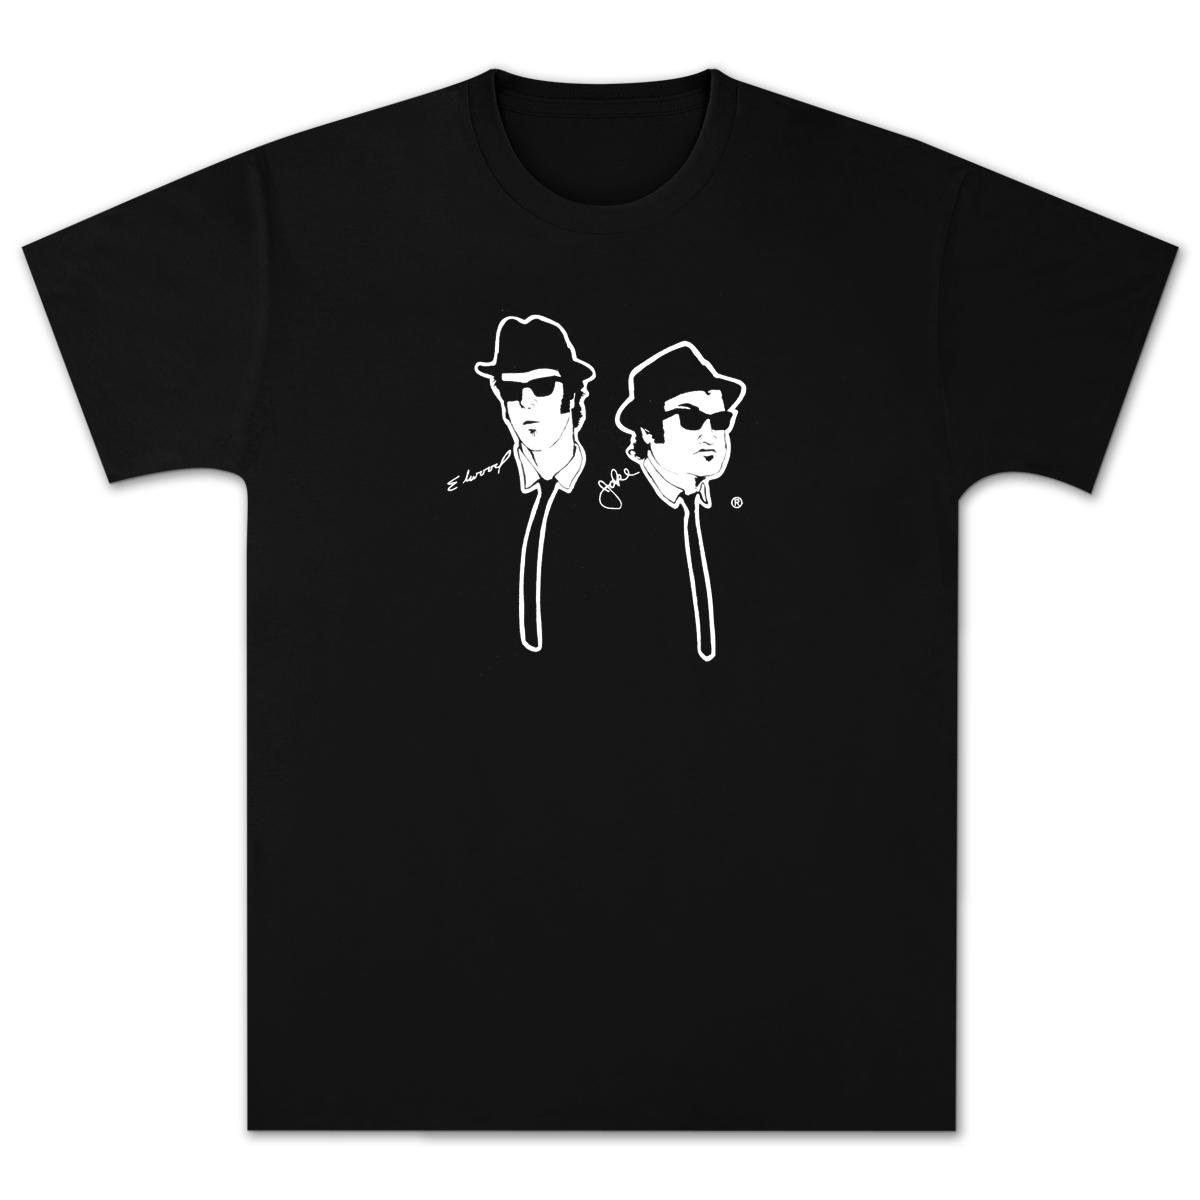 House of Blues Black J&E T-Shirt - Orlando